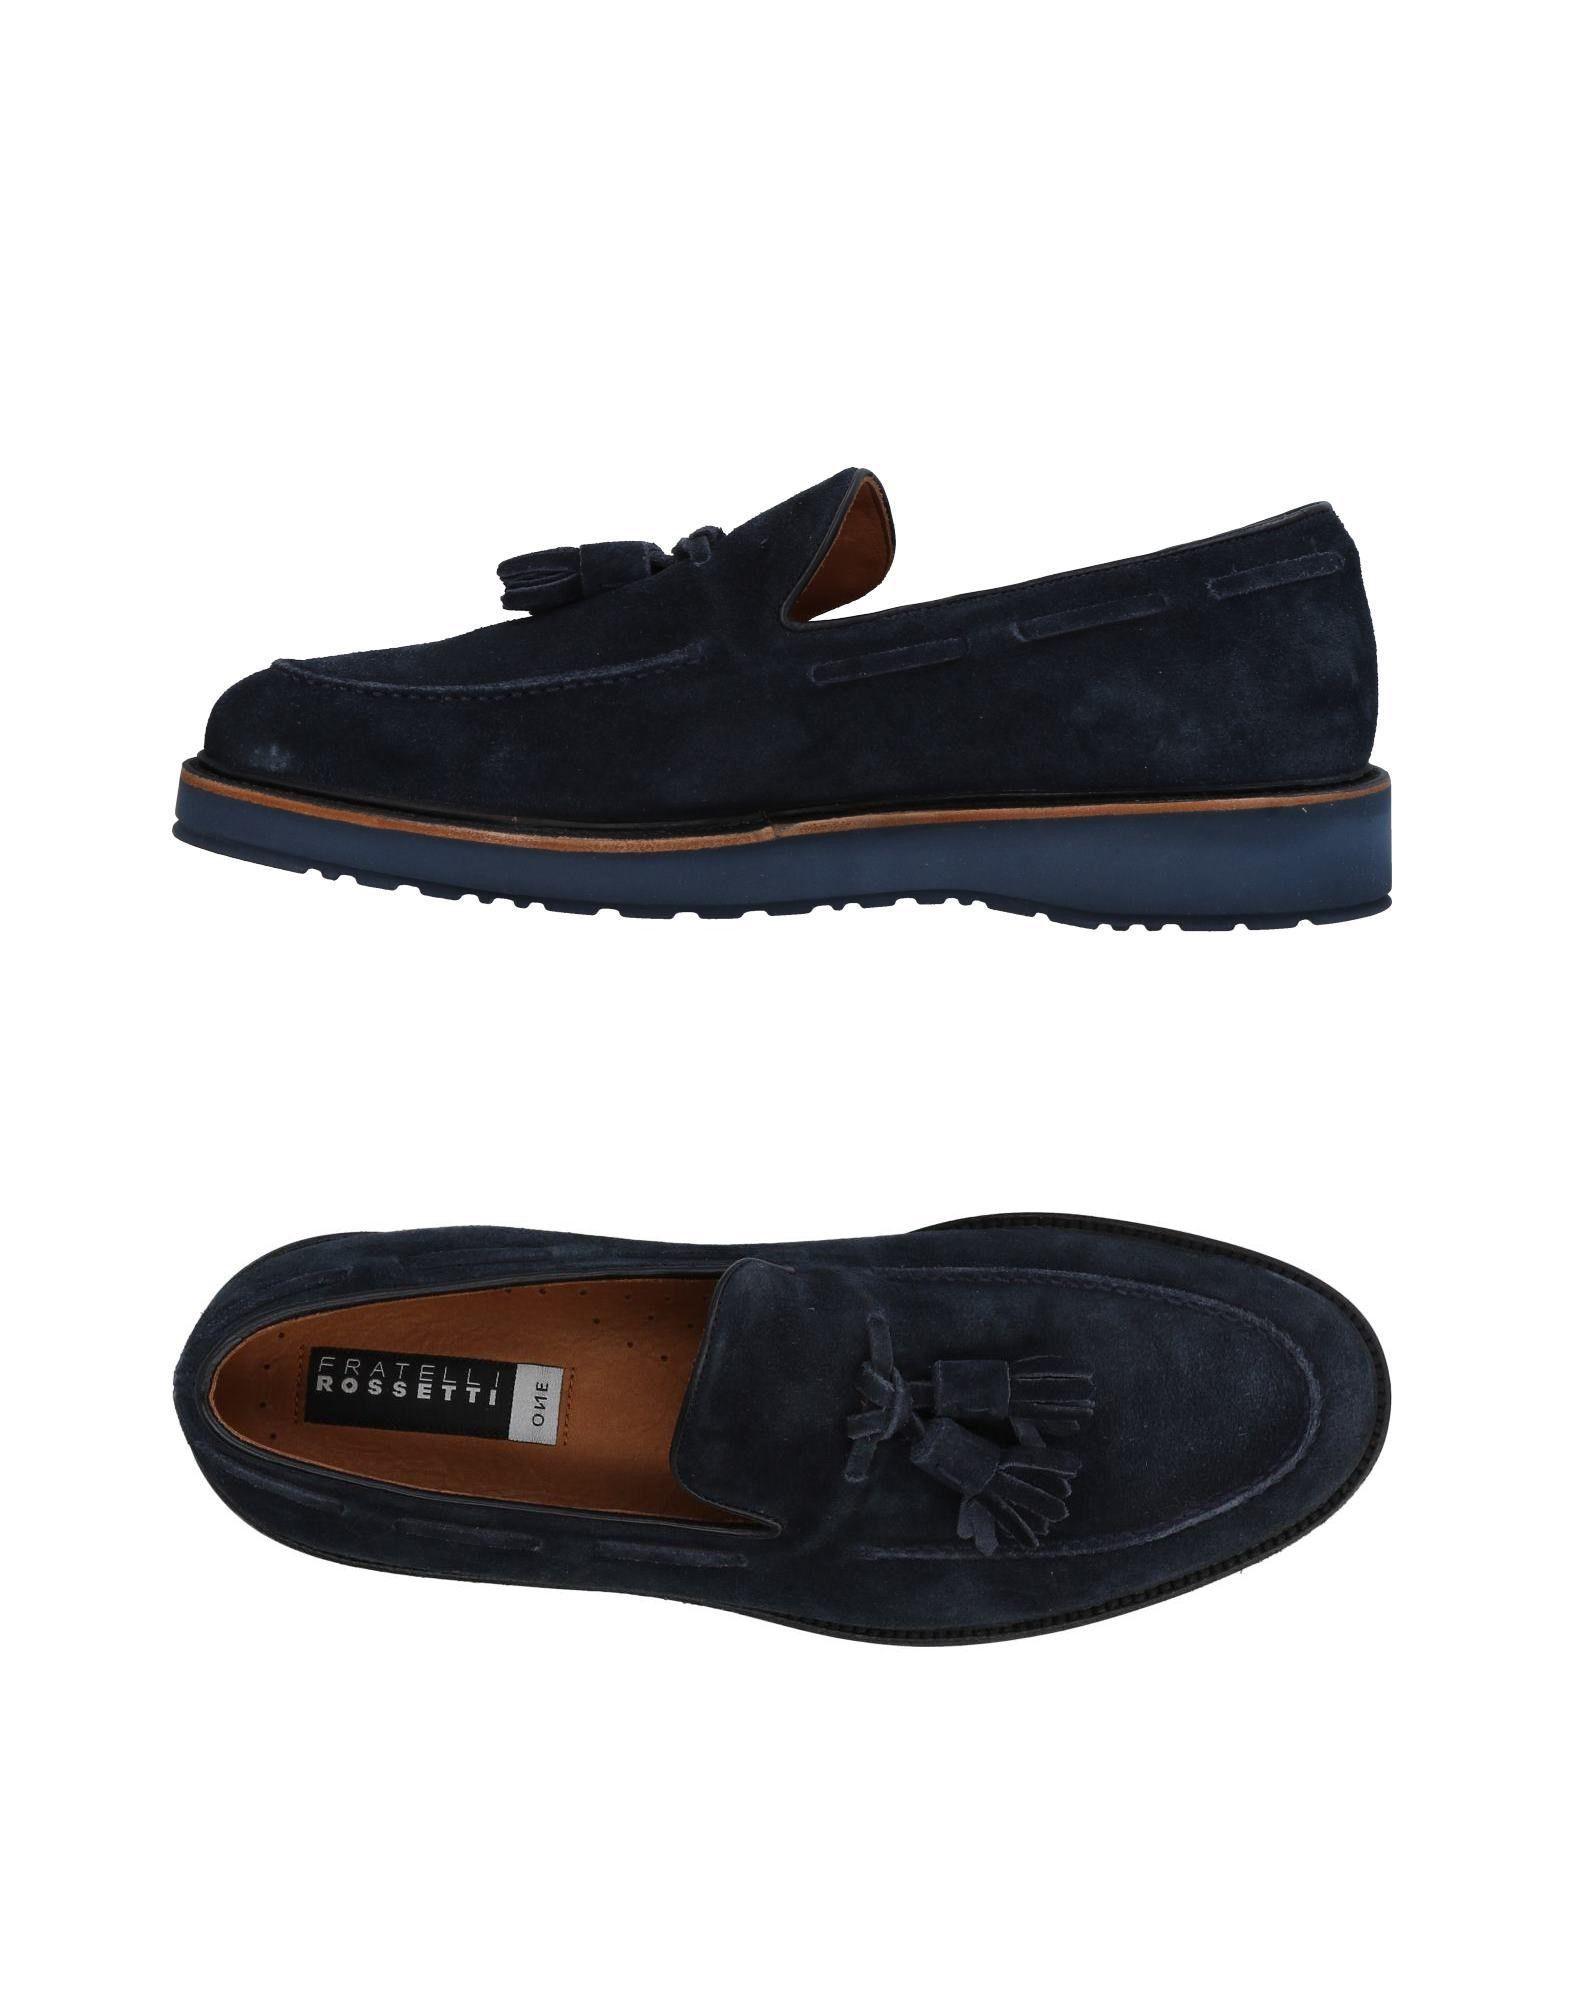 Fratelli Fratelli Fratelli Rossetti Loafers - Men Fratelli Rossetti Loafers online on  Canada - 11440555QW 24ad55